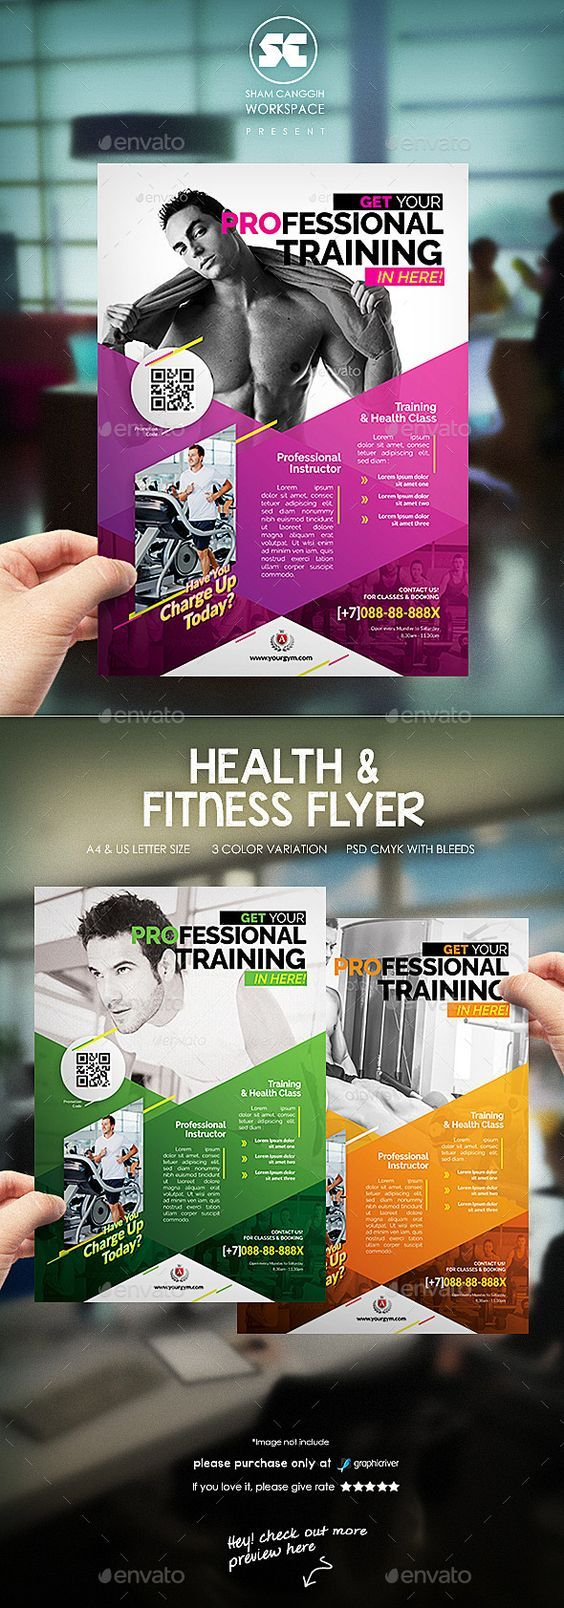 Fitness / Gym Flyer Template PSD #design Download: http://graphicriver.net/item/fitness-gym-flyer-template/12823317?ref=ksioks: